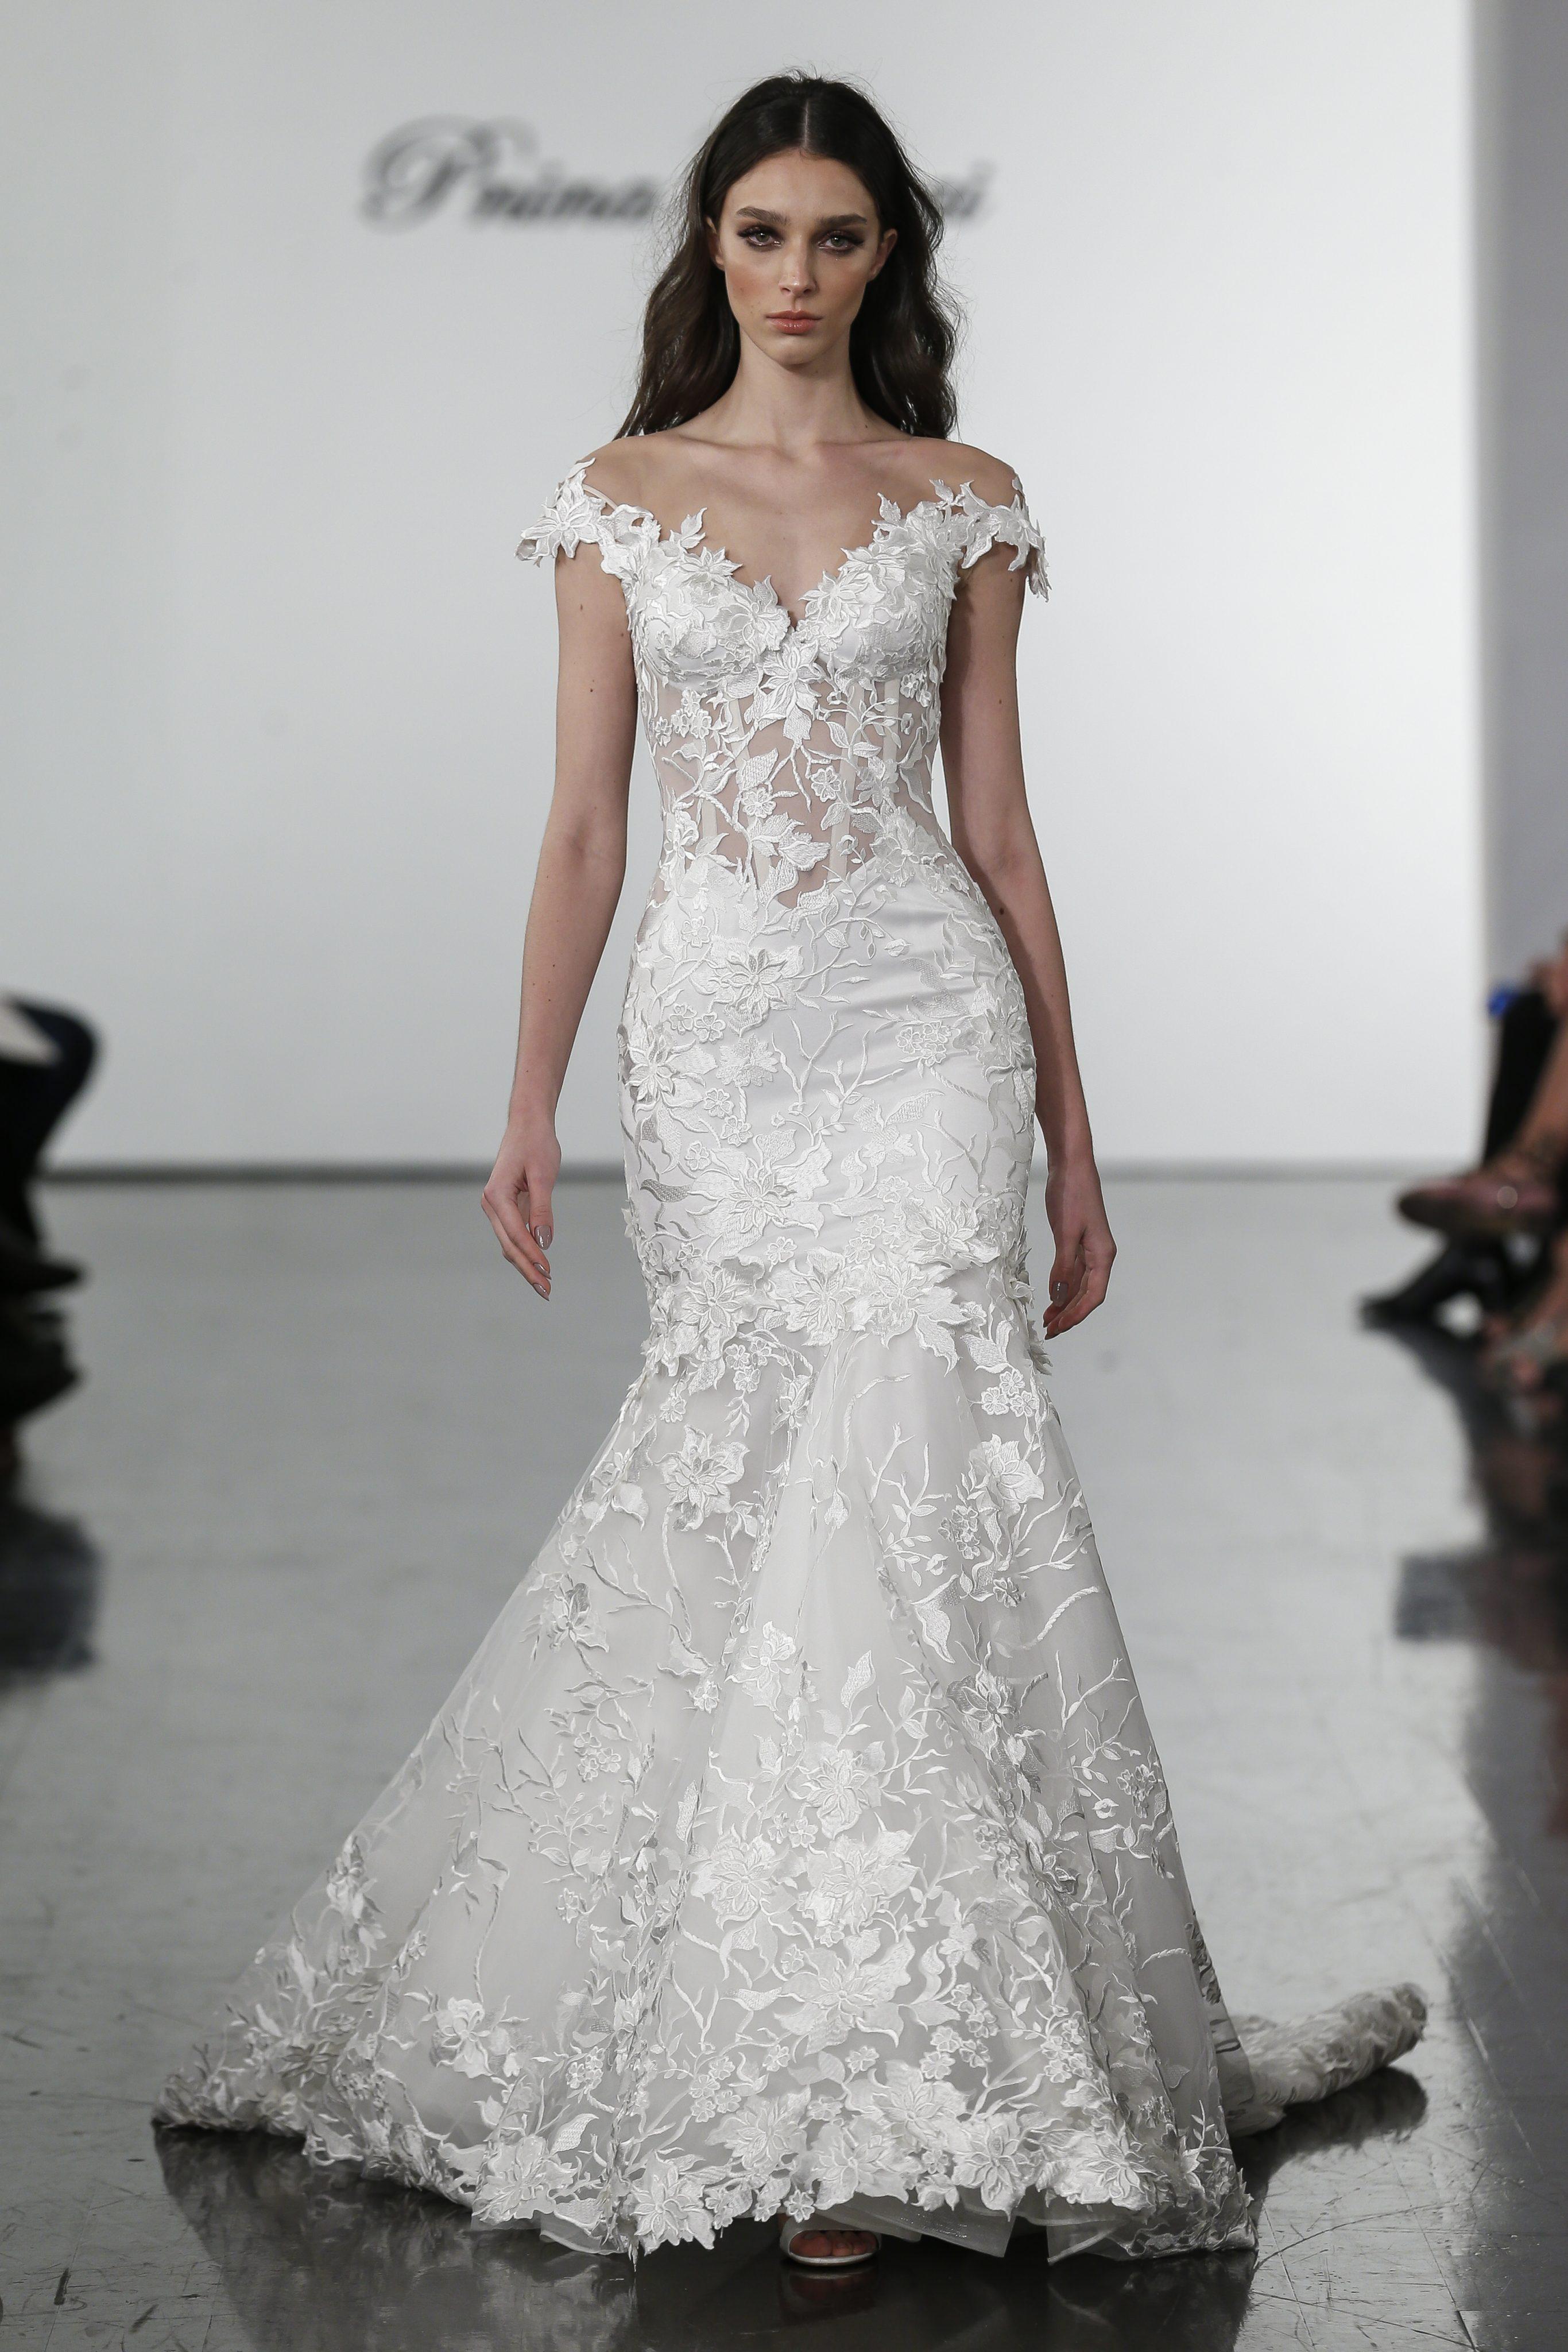 Floral Lace Off The Shoulder Mermaid Wedding Dress Kleinfeld Bridal